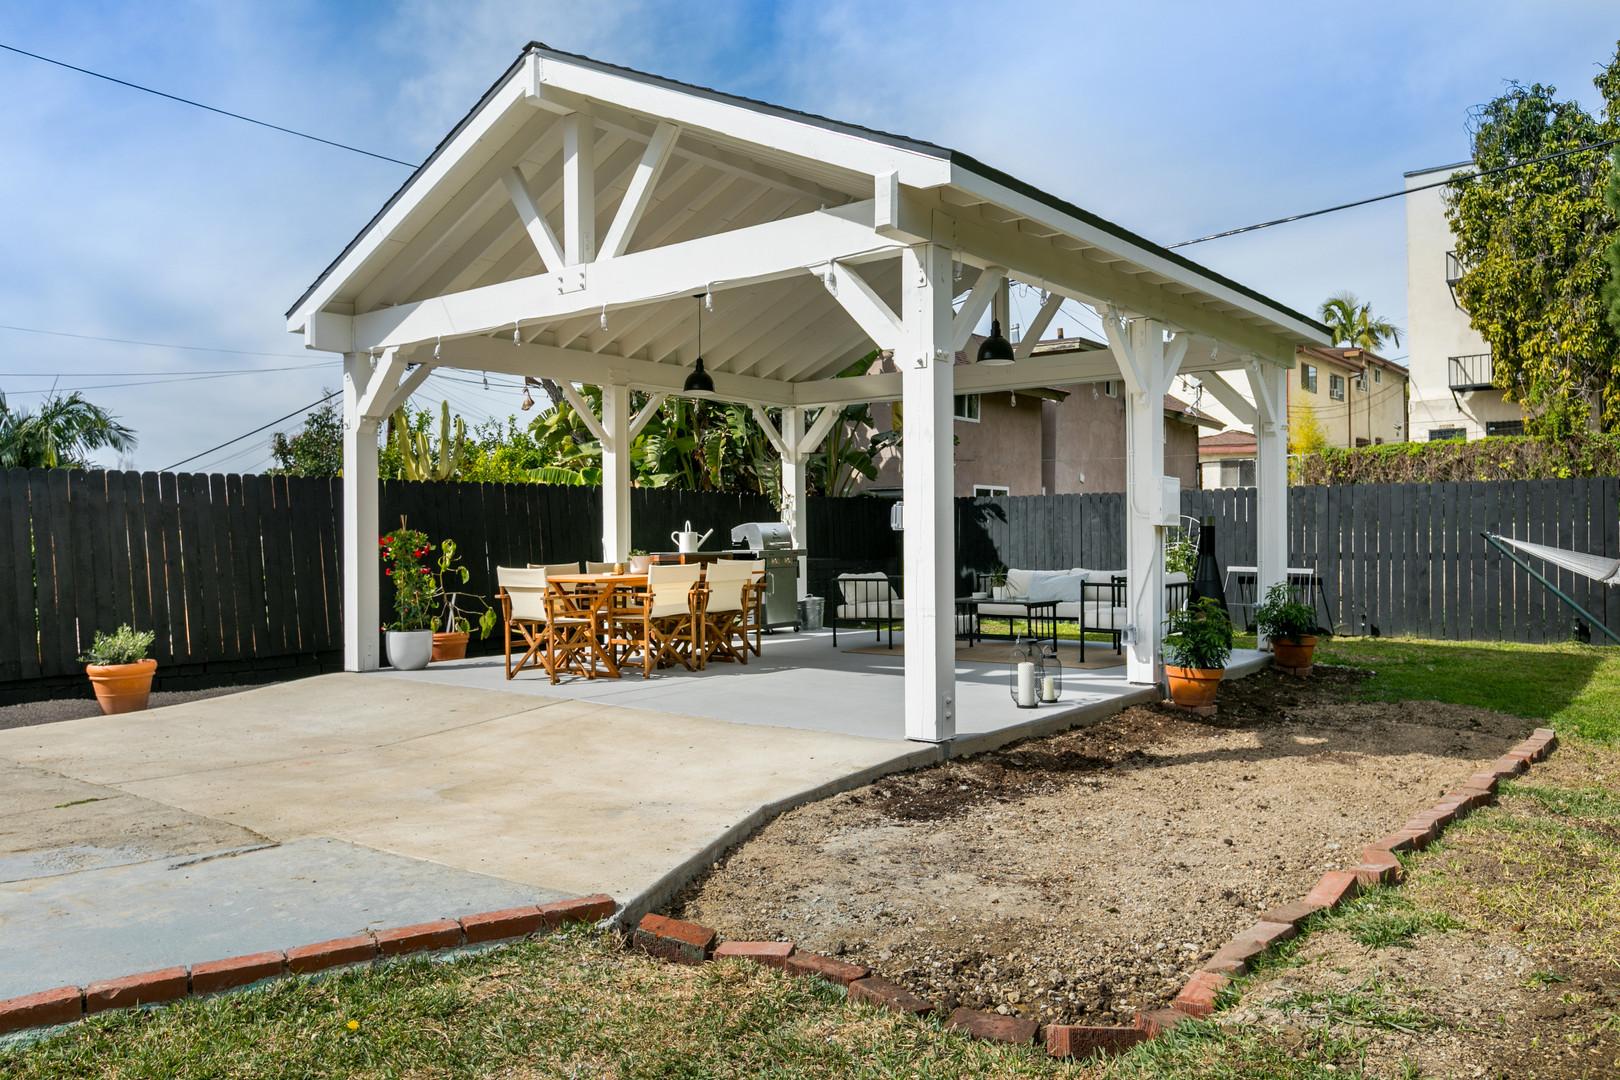 Patio & Backyard Remodel